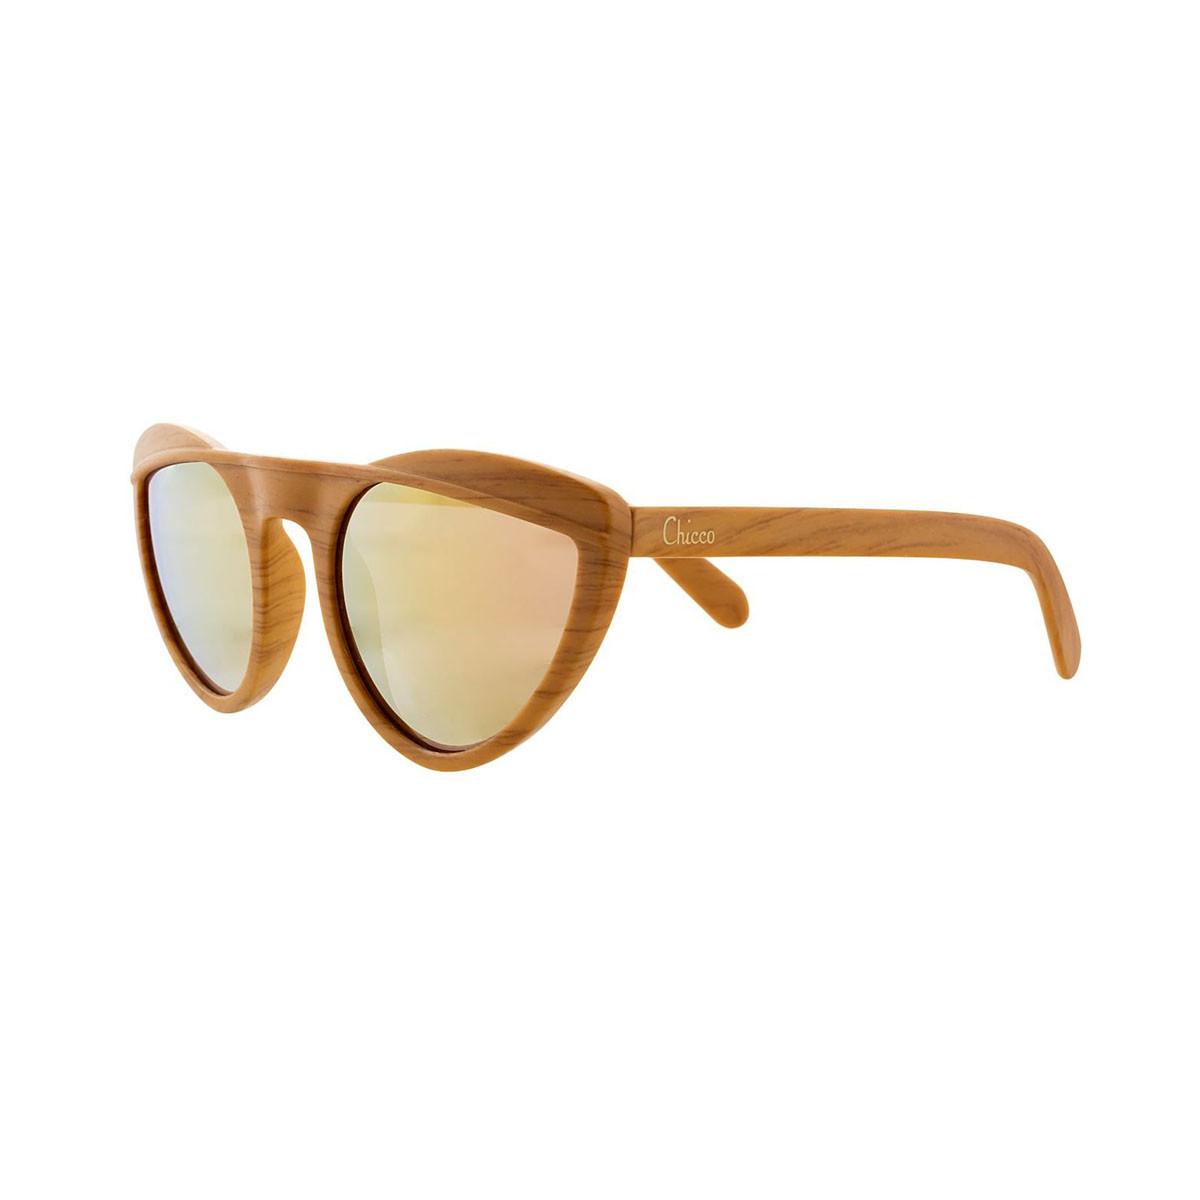 Chicco naočare za sunce, 5G+